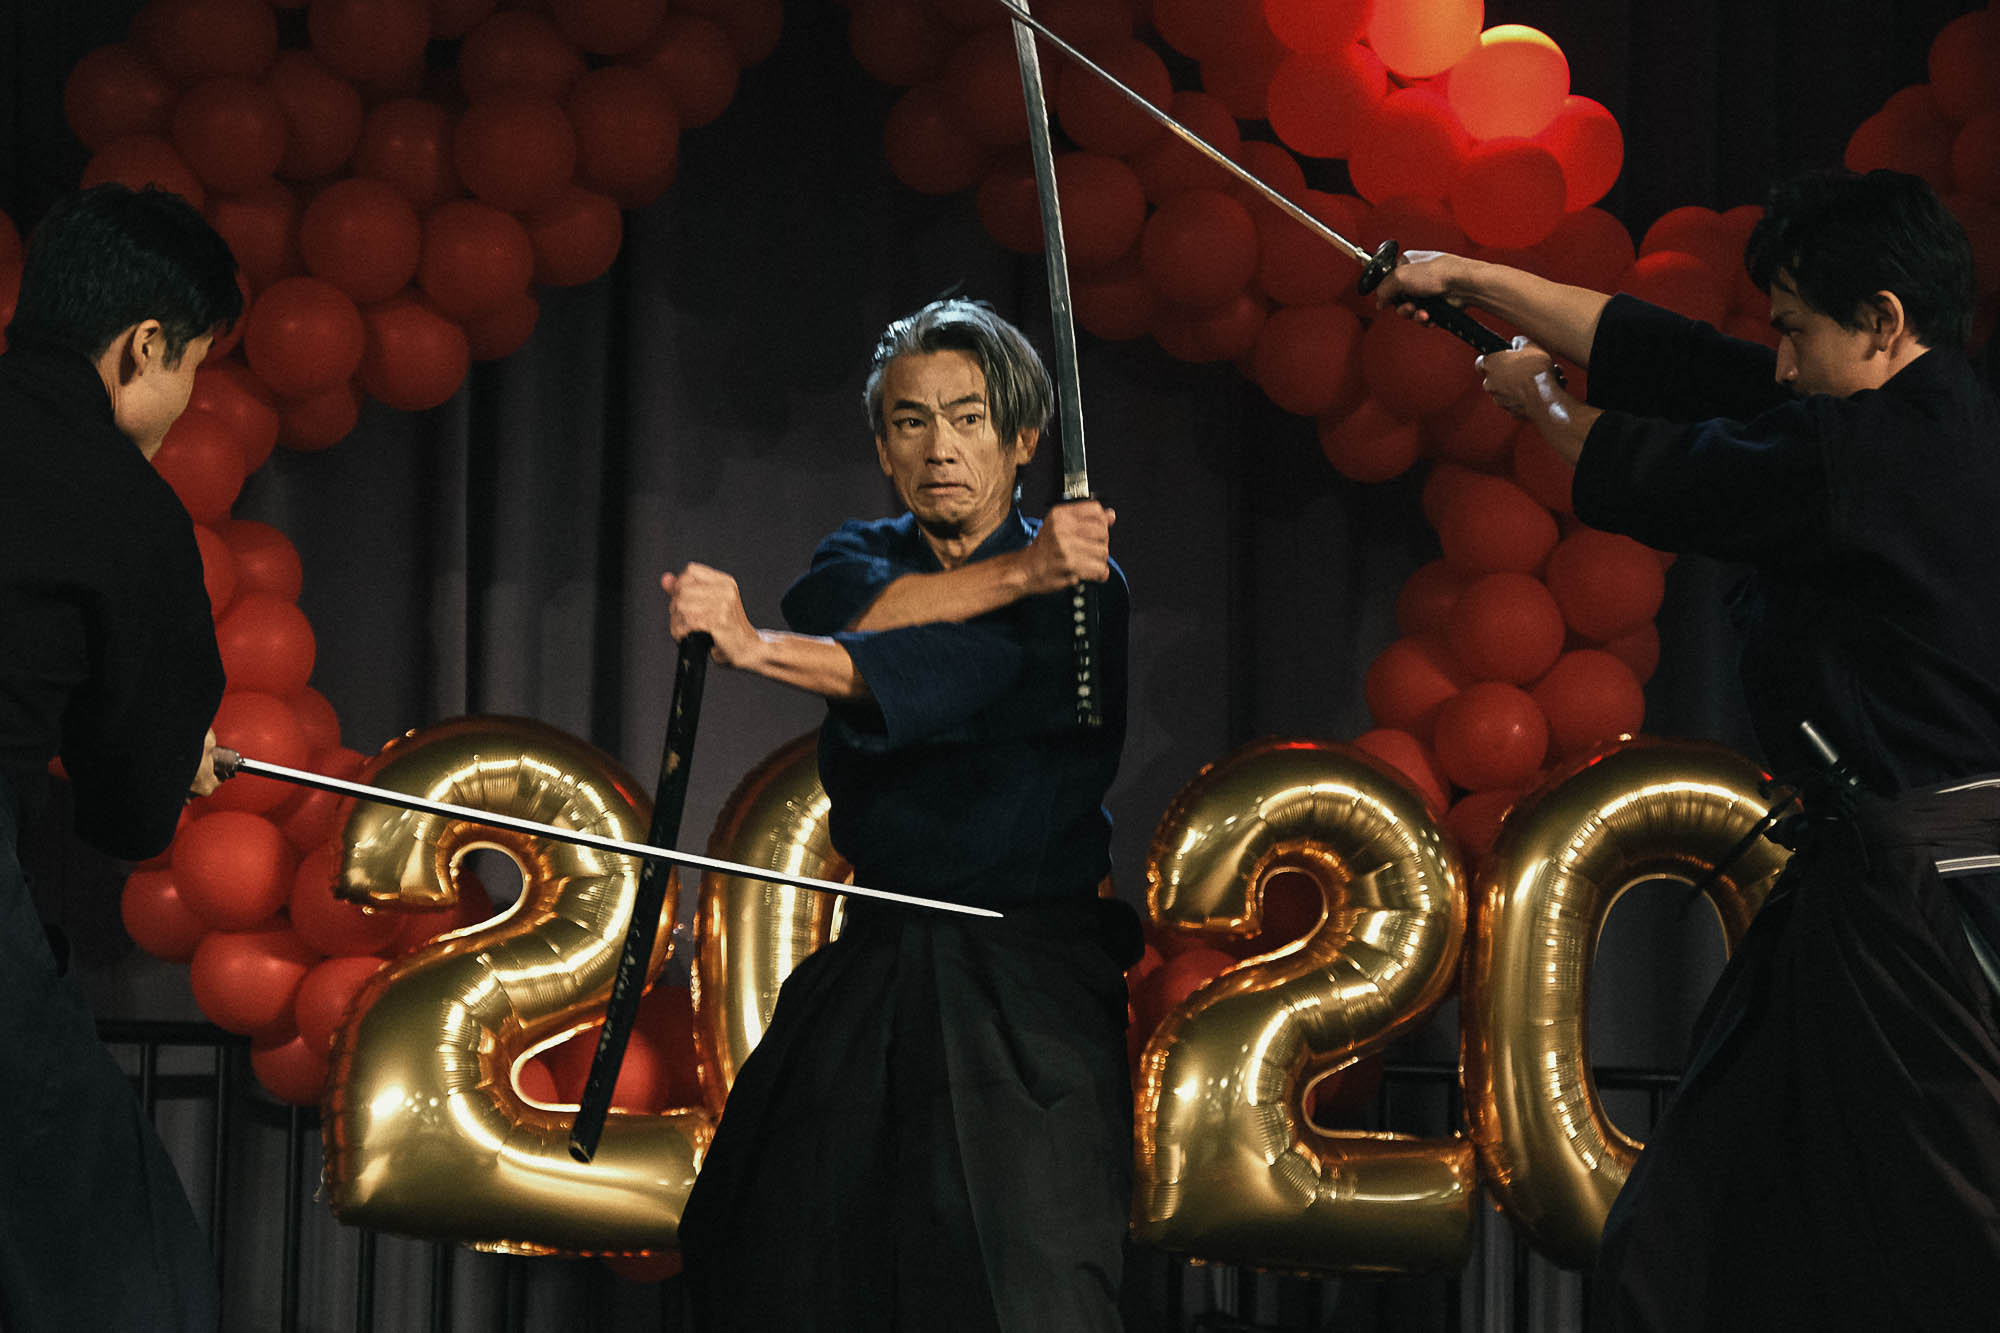 Samurai Workshop with Yoshi Amao from Samurai Sword Soul